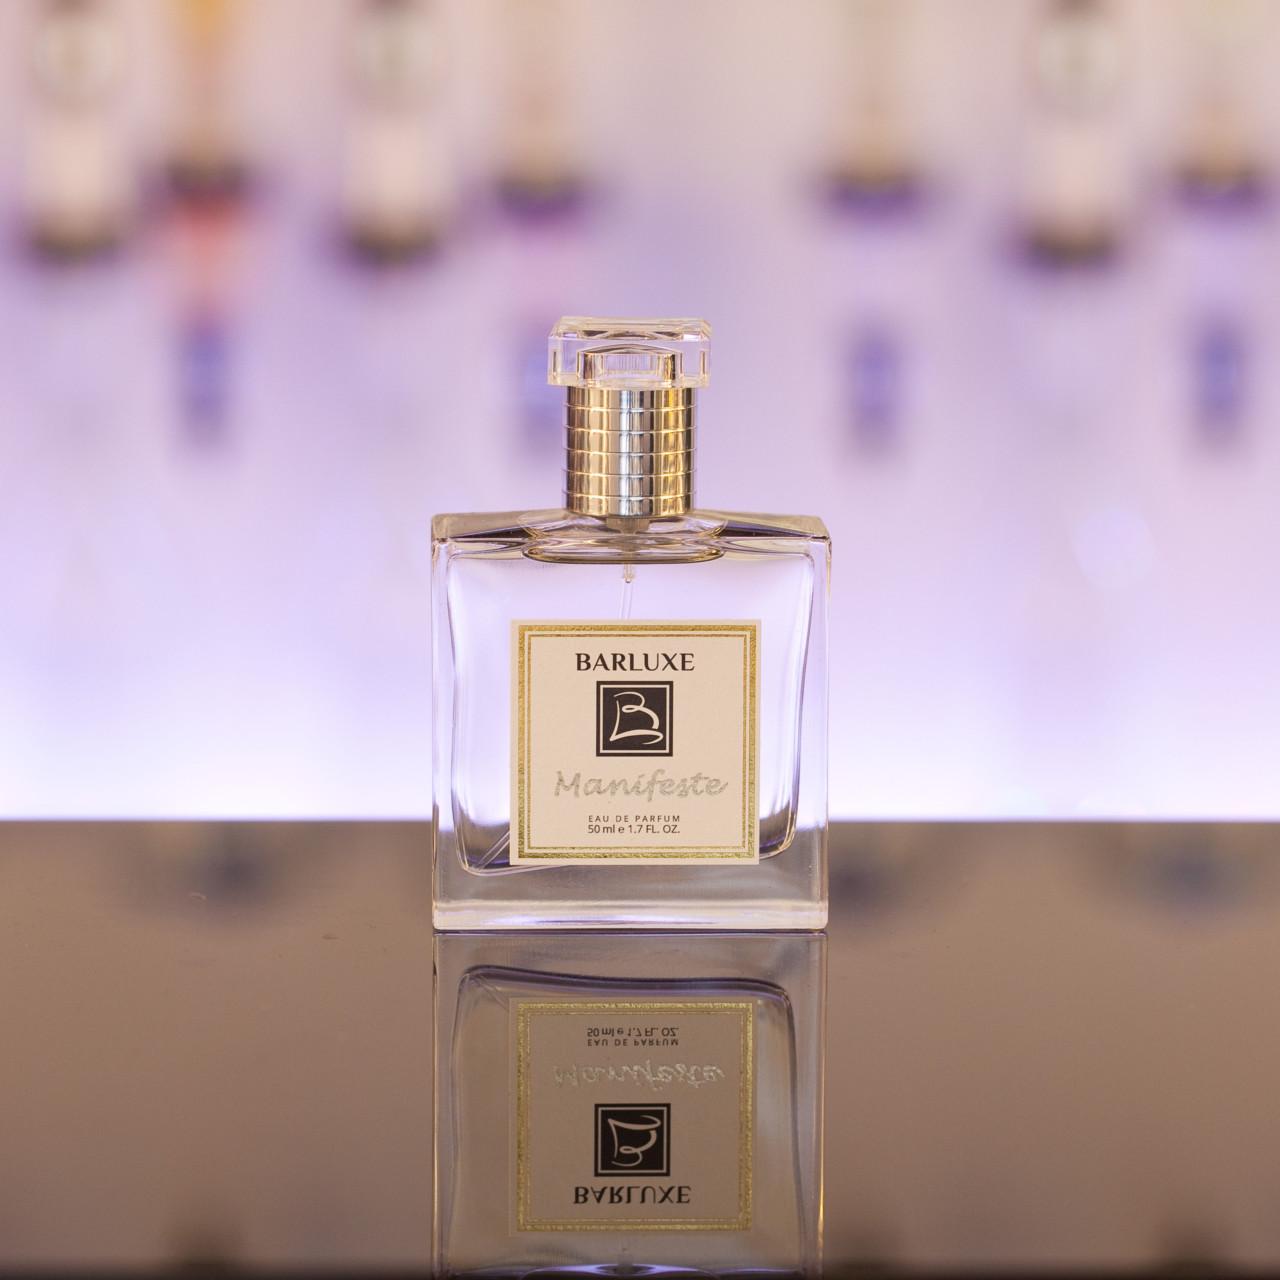 herren-parfum-dupe-double-duft-duftzwilling-manifeste